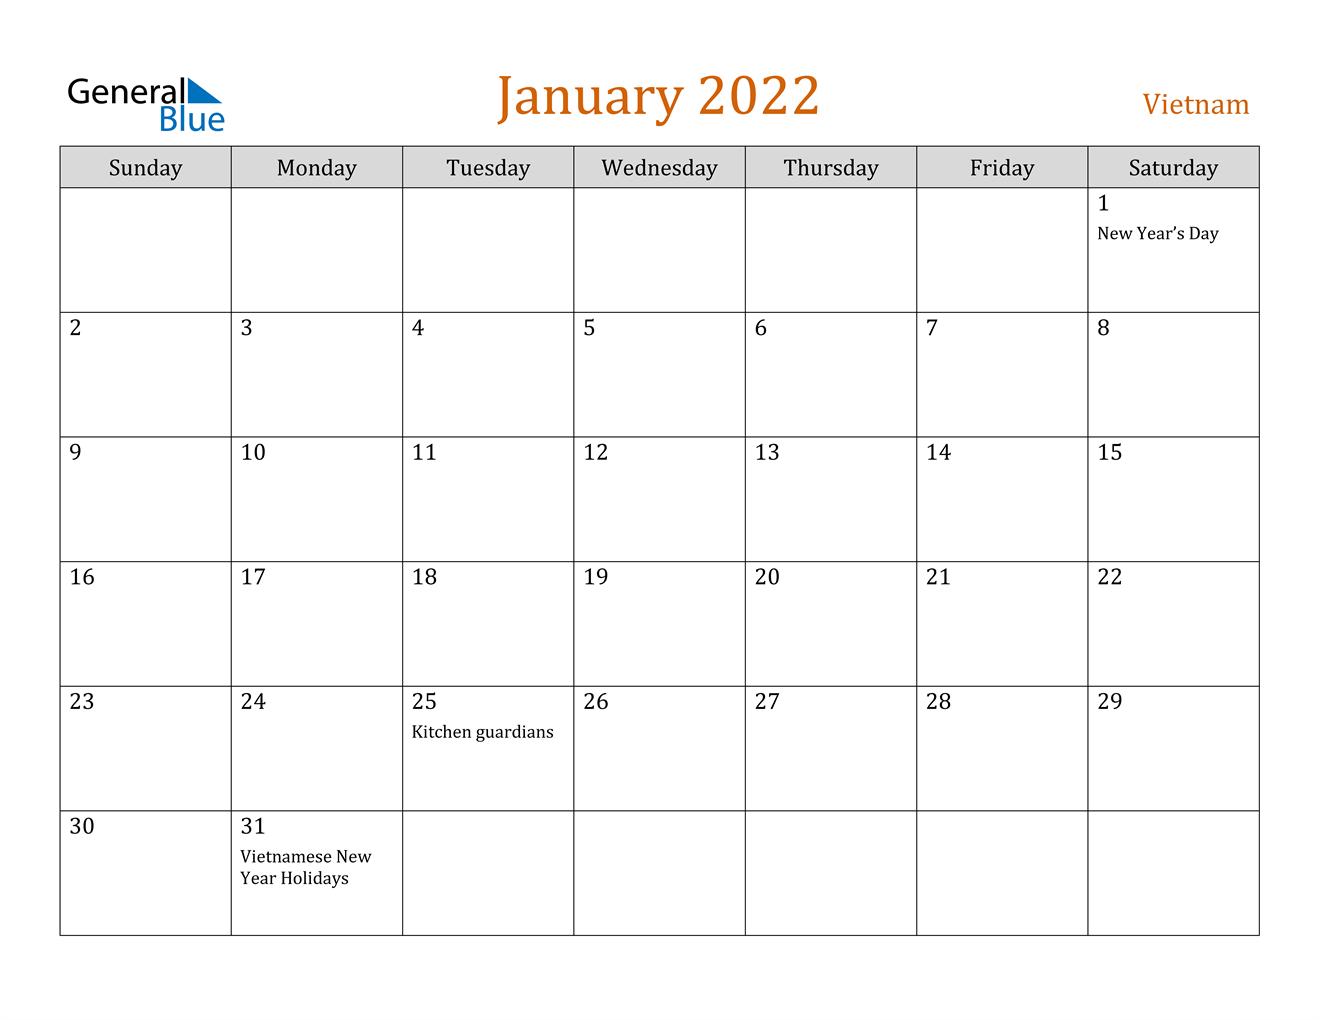 January 2022 Calendar - Vietnam